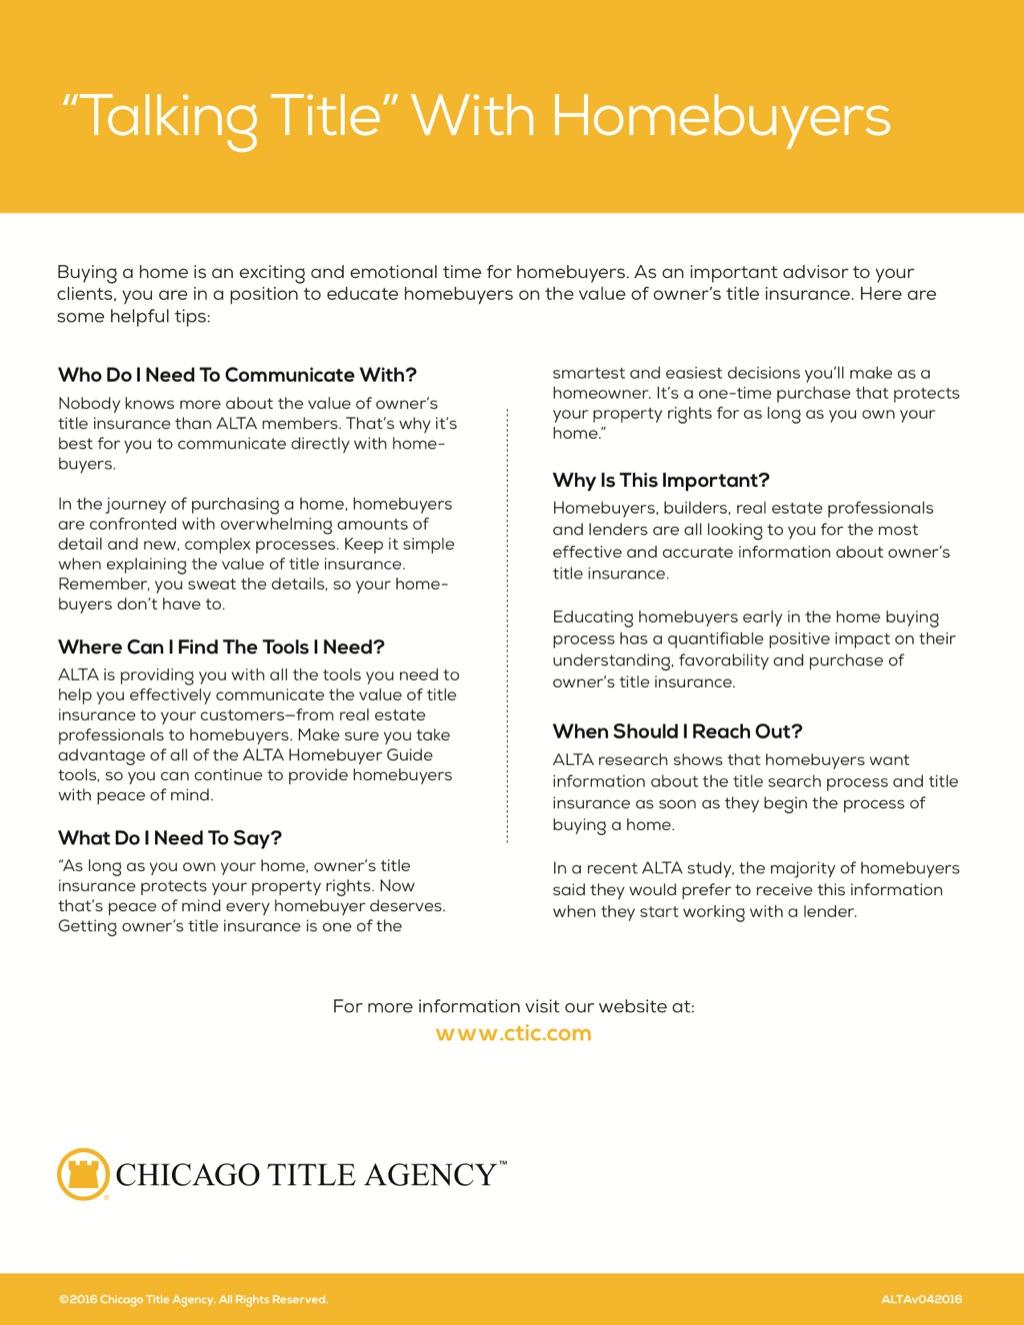 Corefact Talking title Homebuyers - CTA